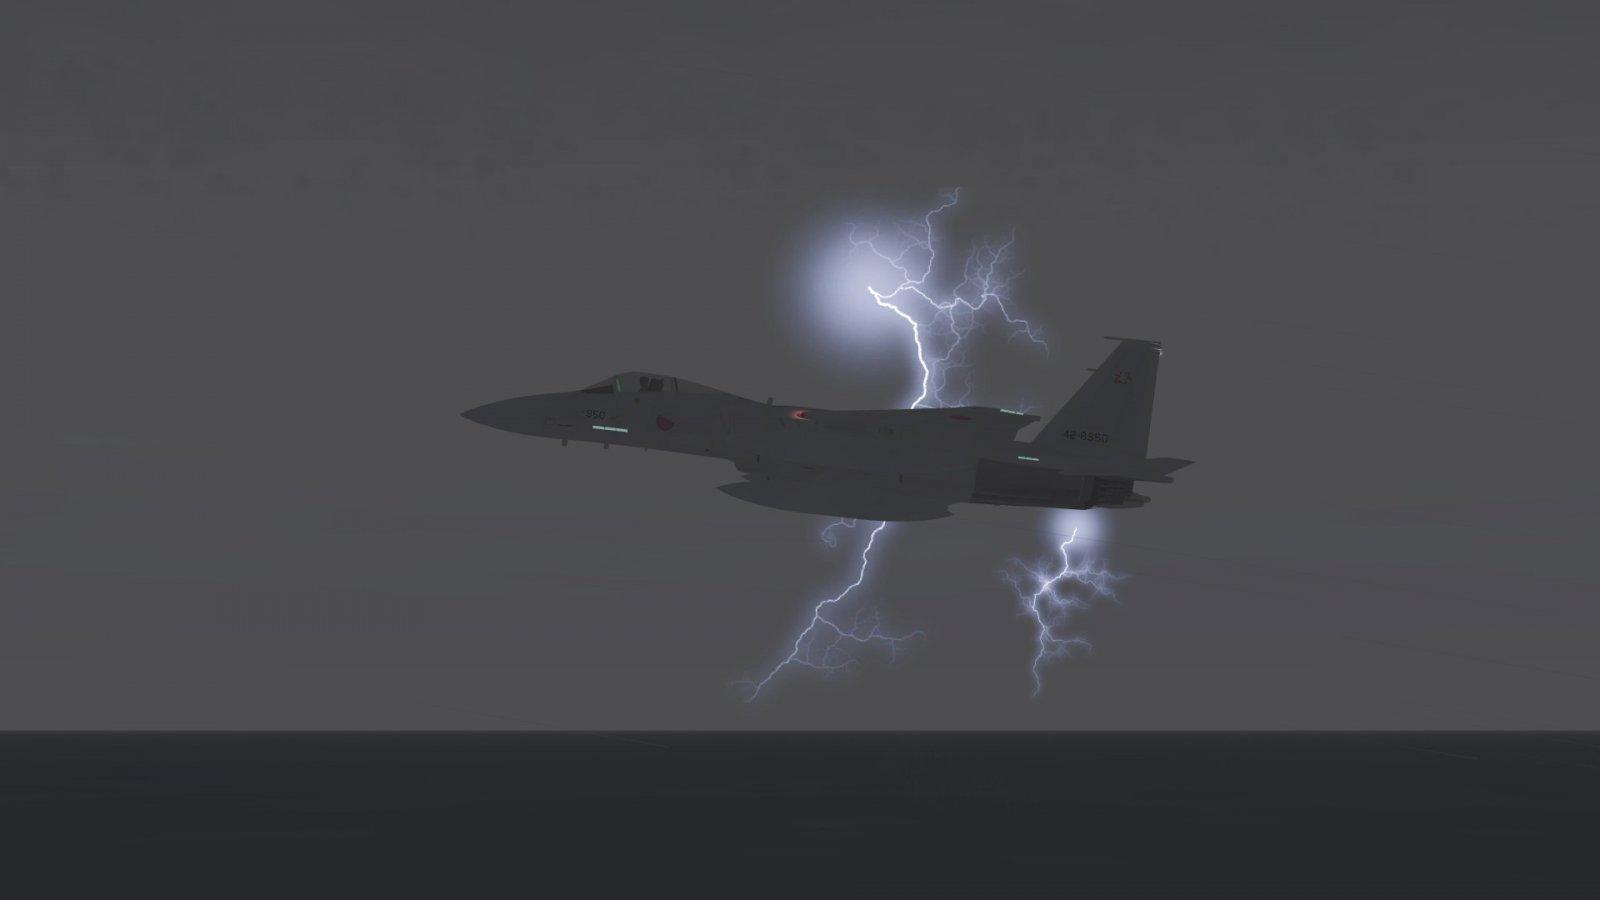 F-15J Posing With Lightning Bolts